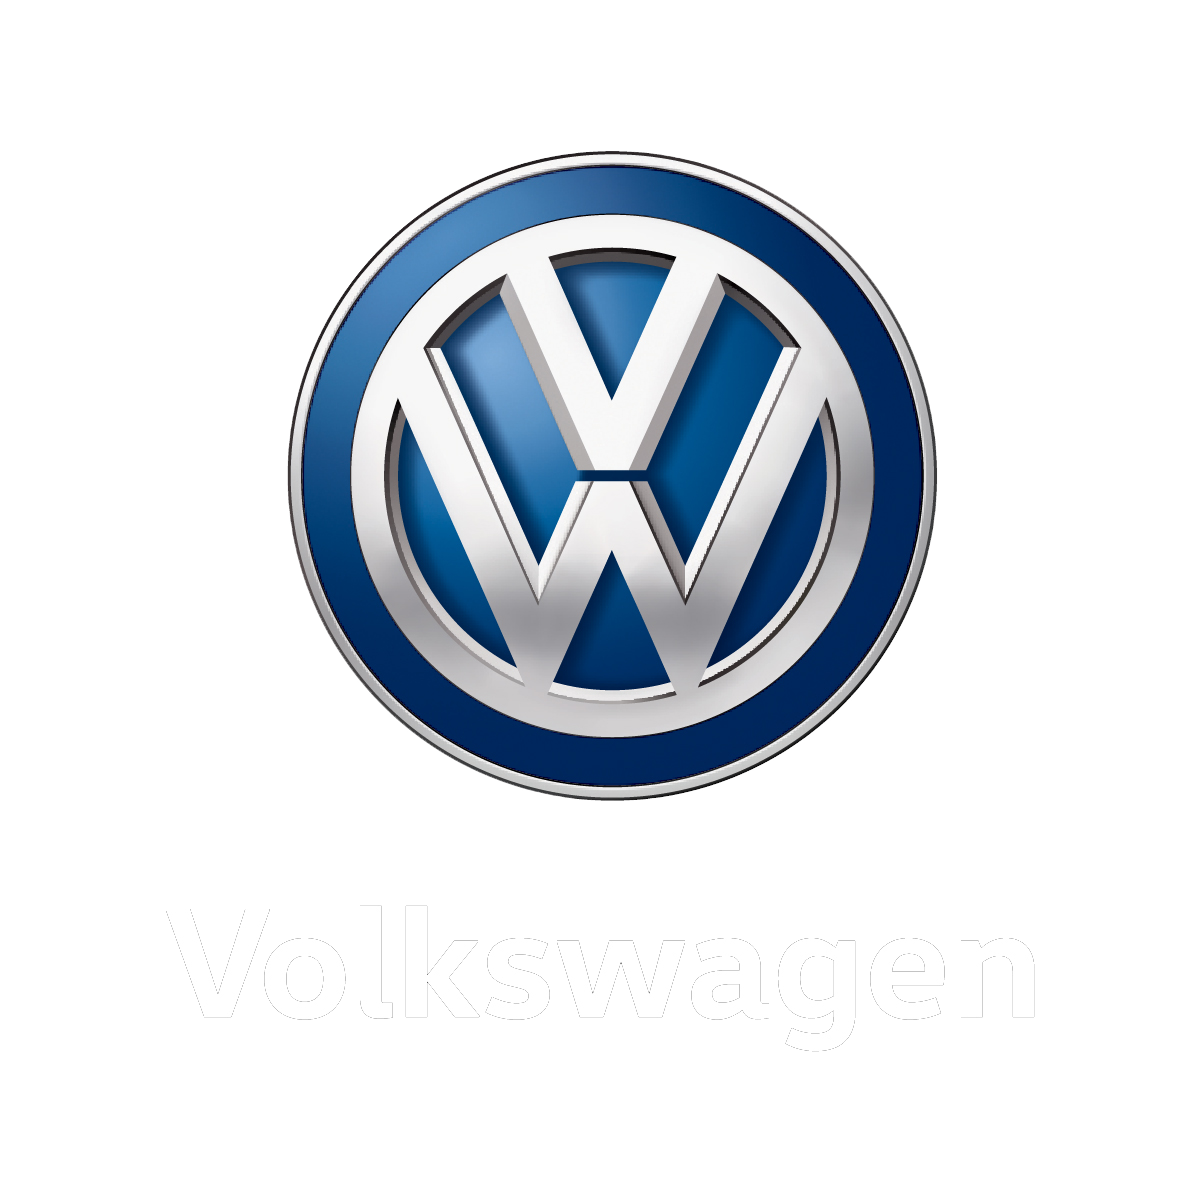 Volkswagen Body Shop In Houston Tx West Houston Vw